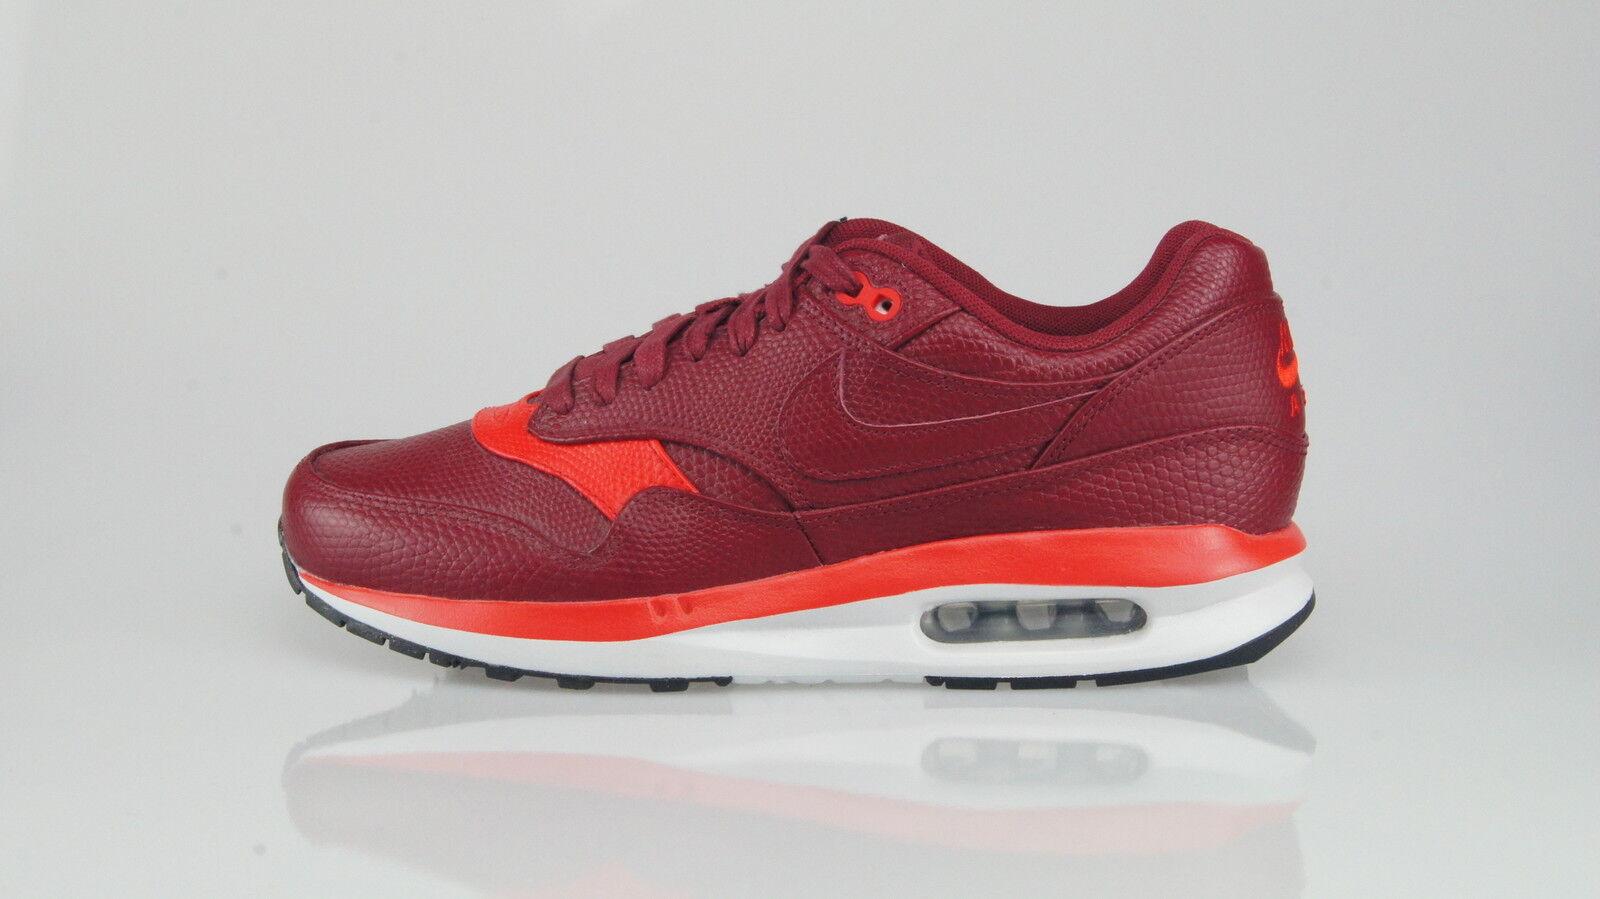 Nike air Max lunar 1 Luxus Größe 41 (8US)